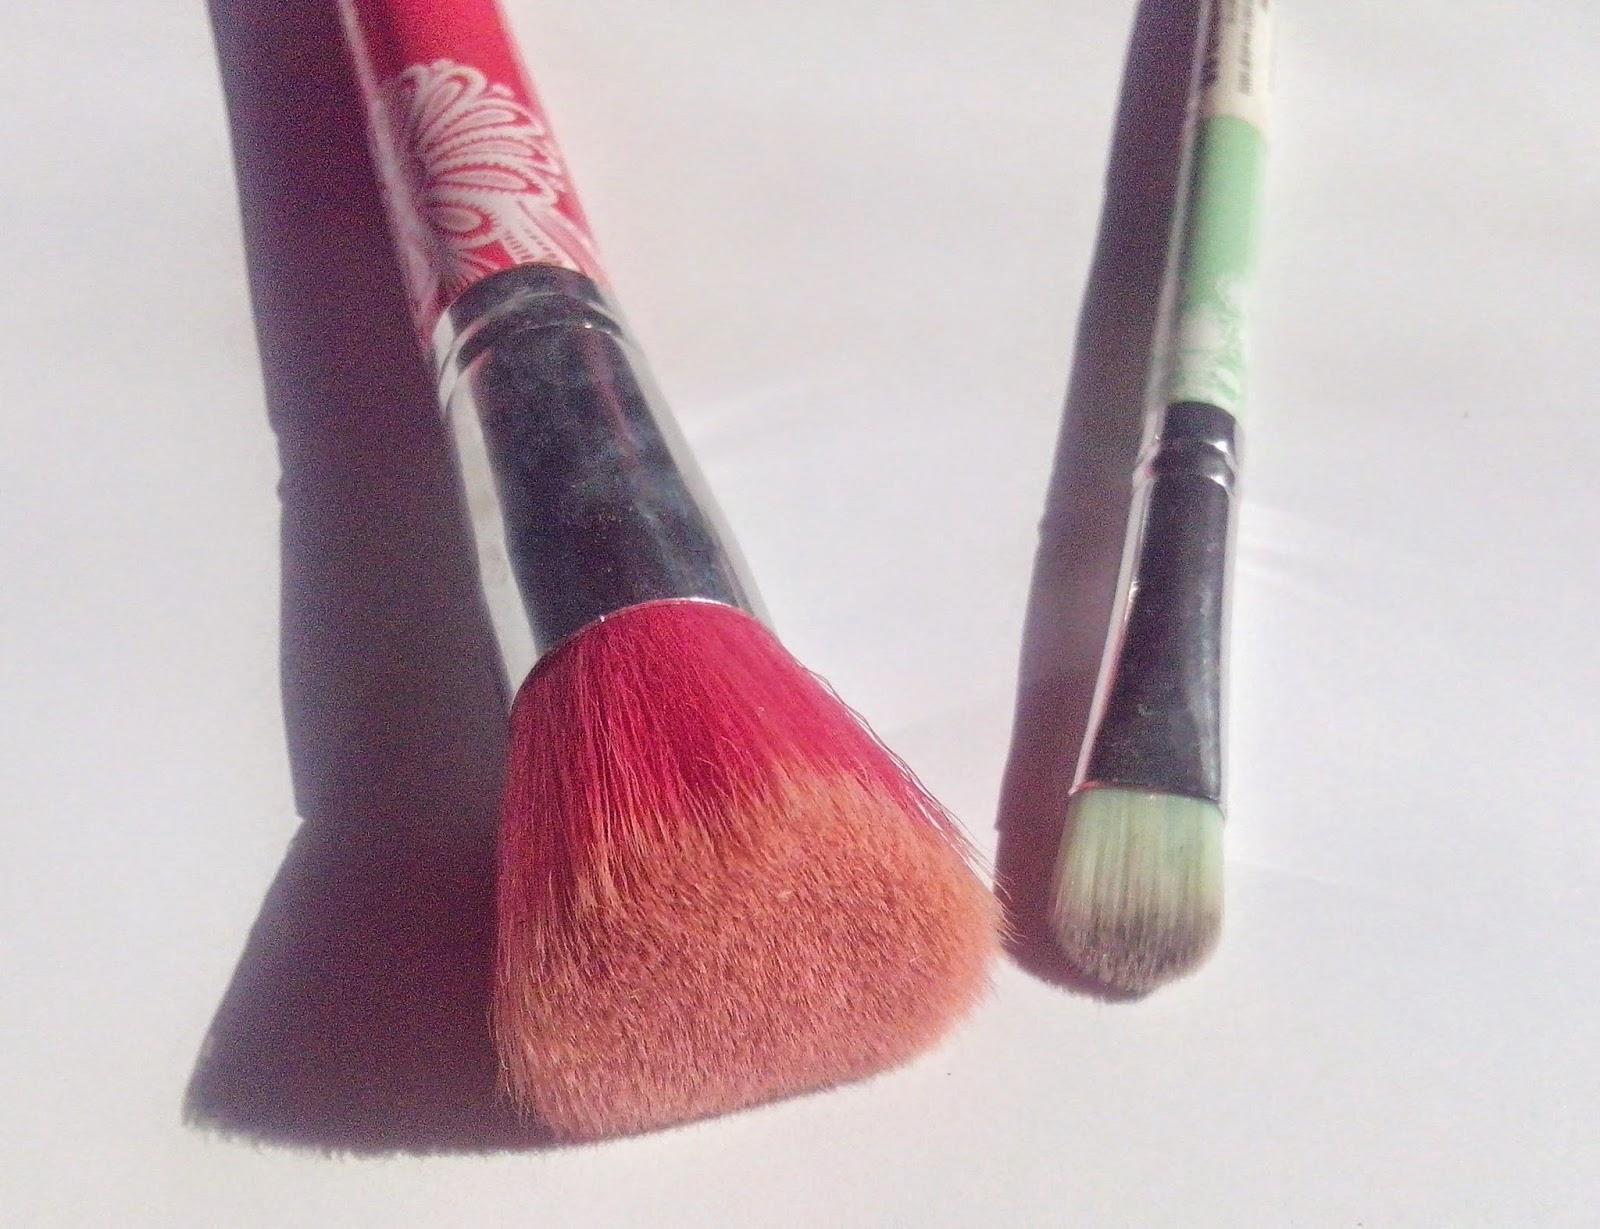 essence-bloom-me-up-blush-brush-eyeshadow-brush-picture